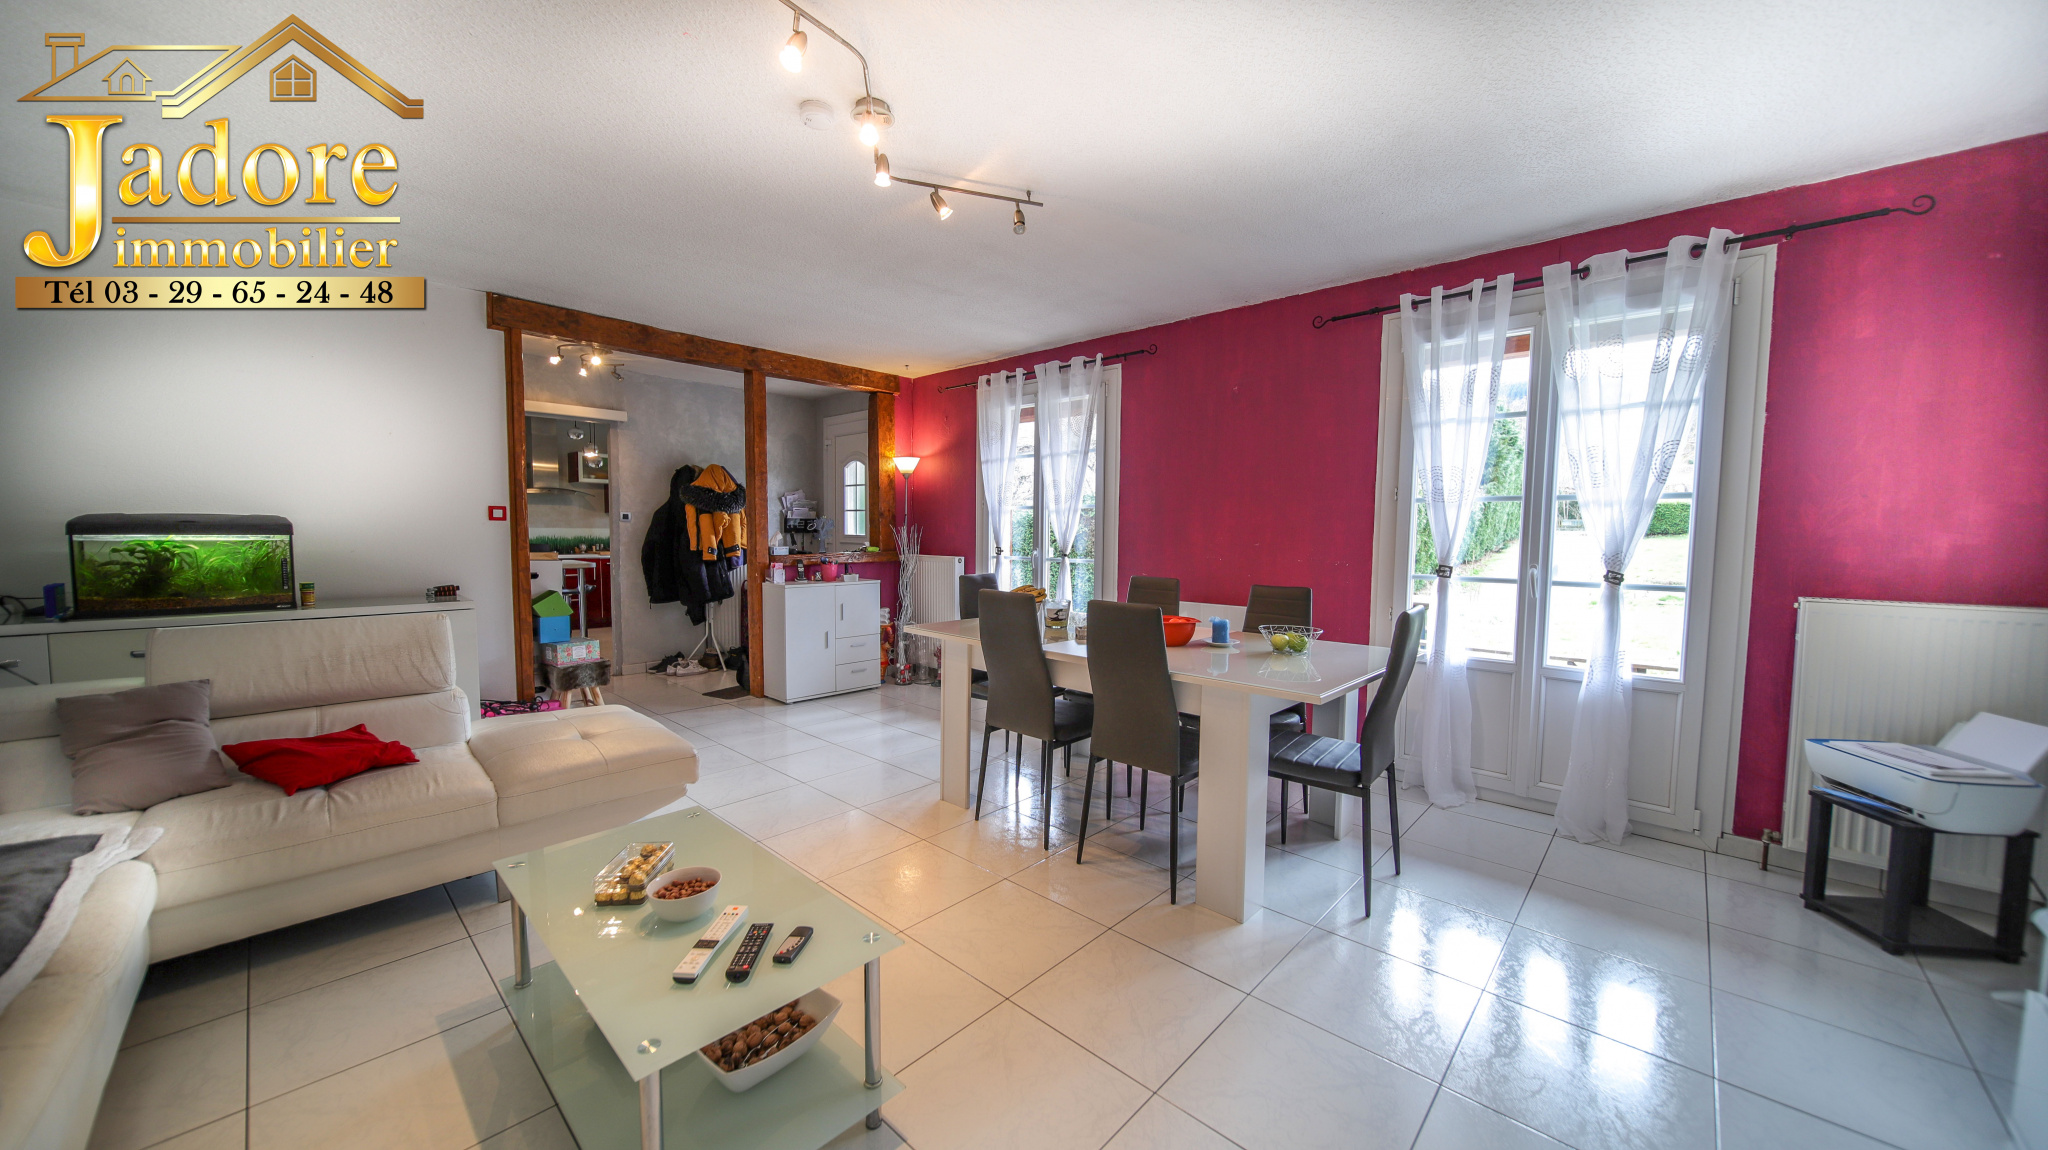 maison/villa à vendre lubine